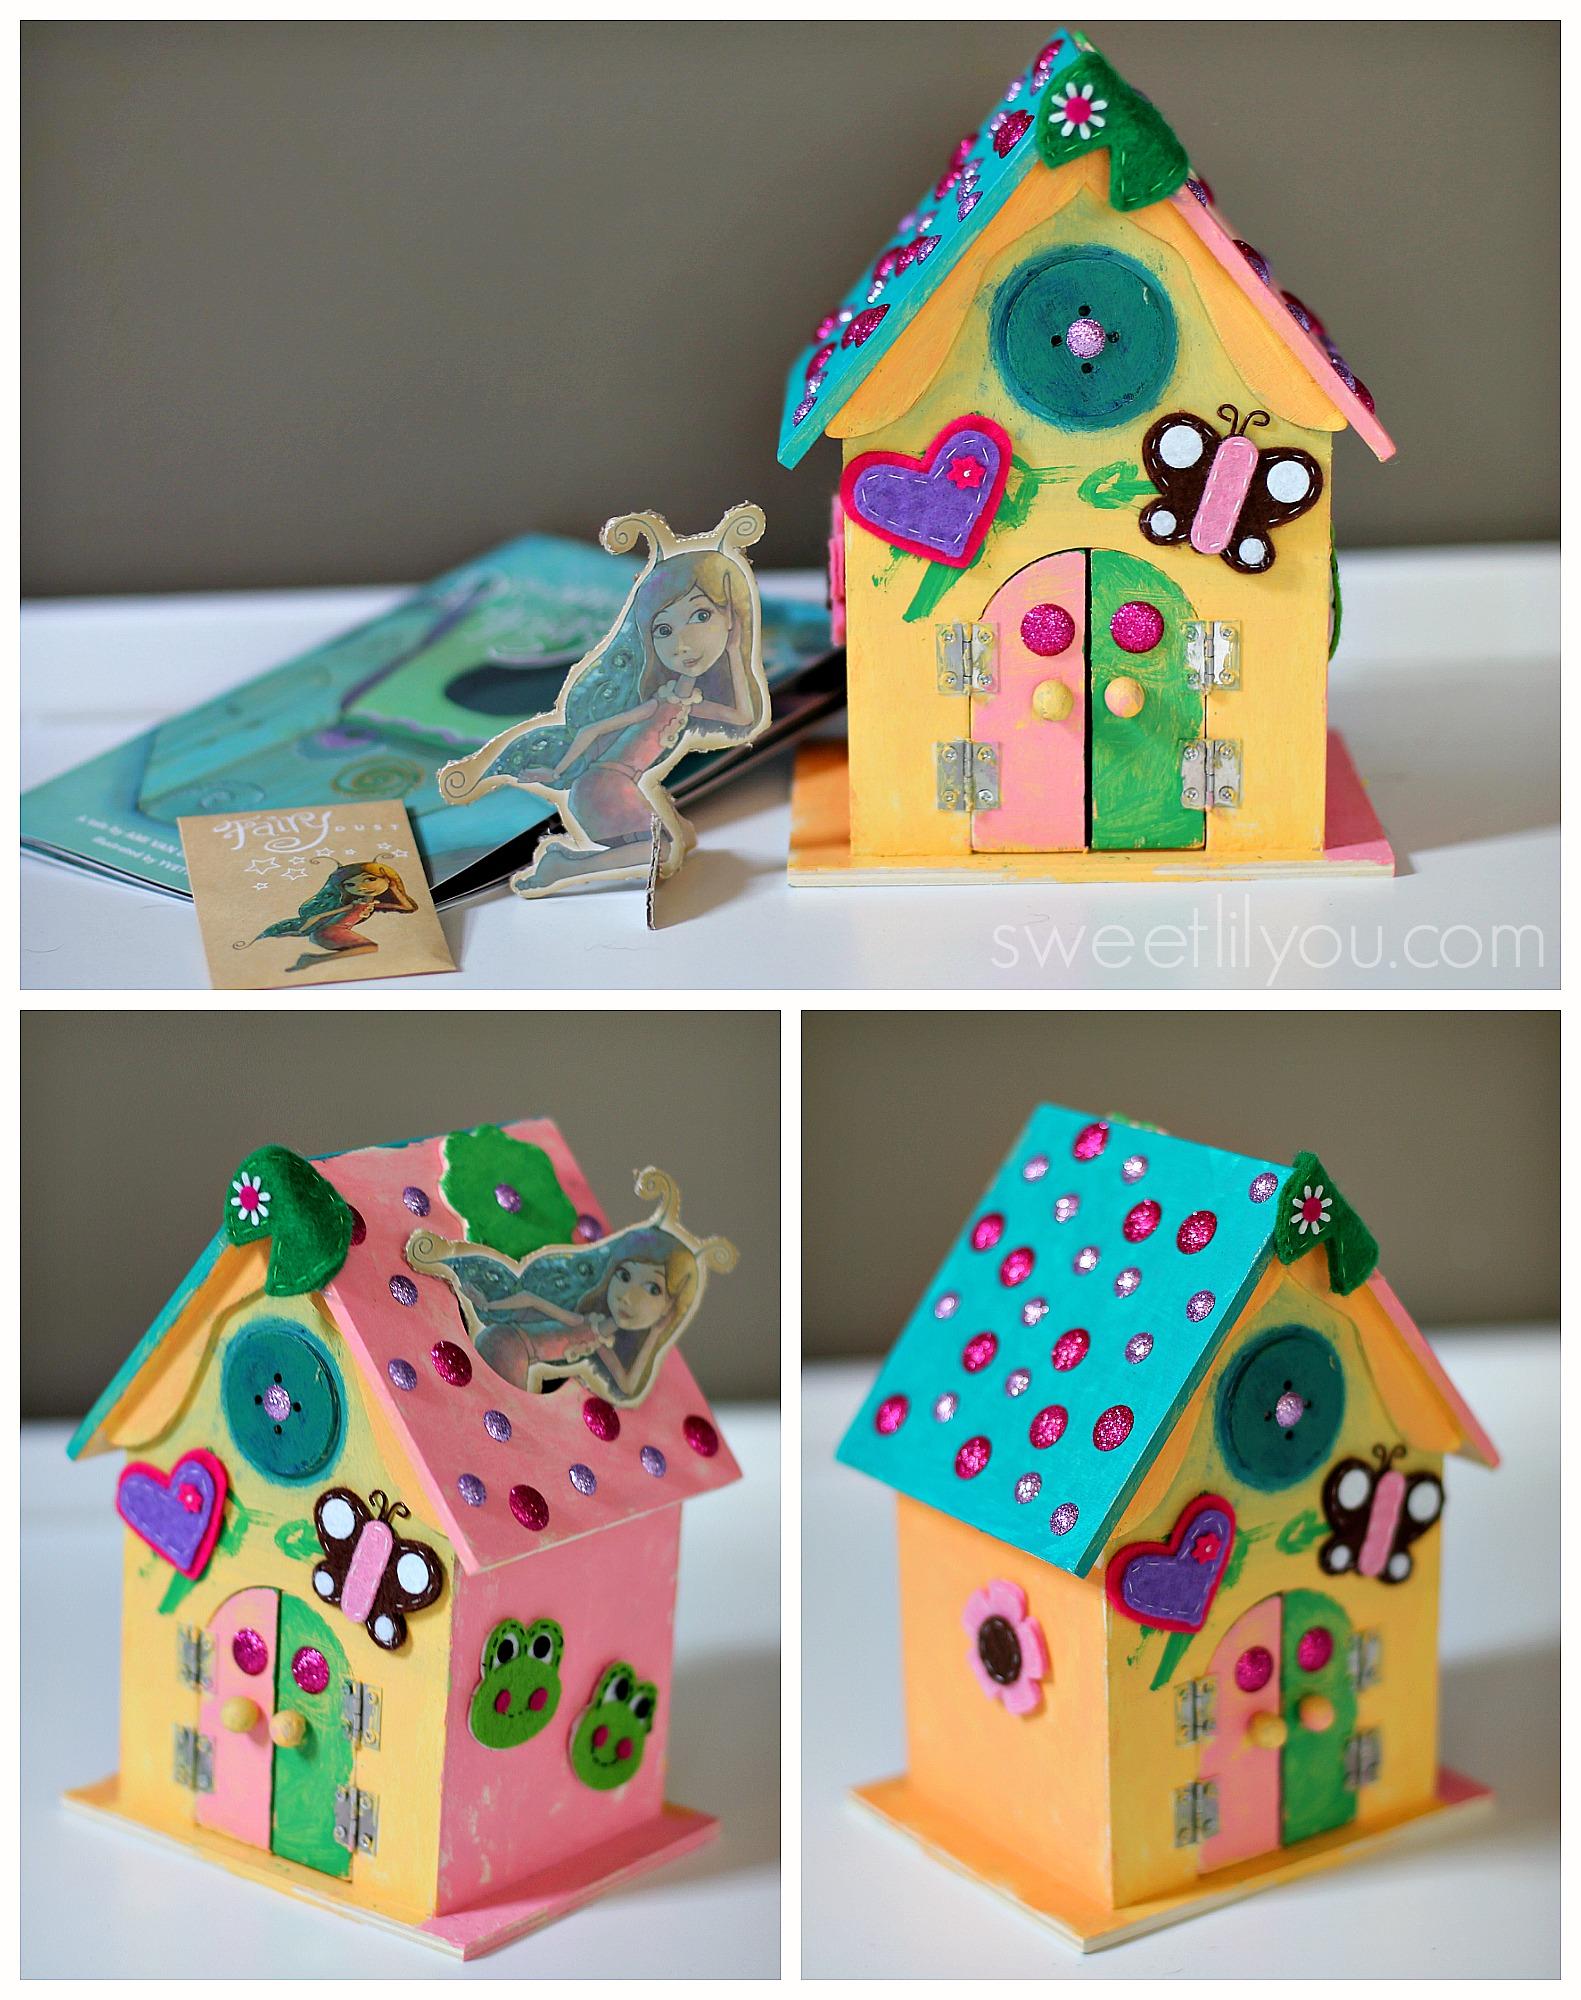 dreamland-fairy-painting-kit